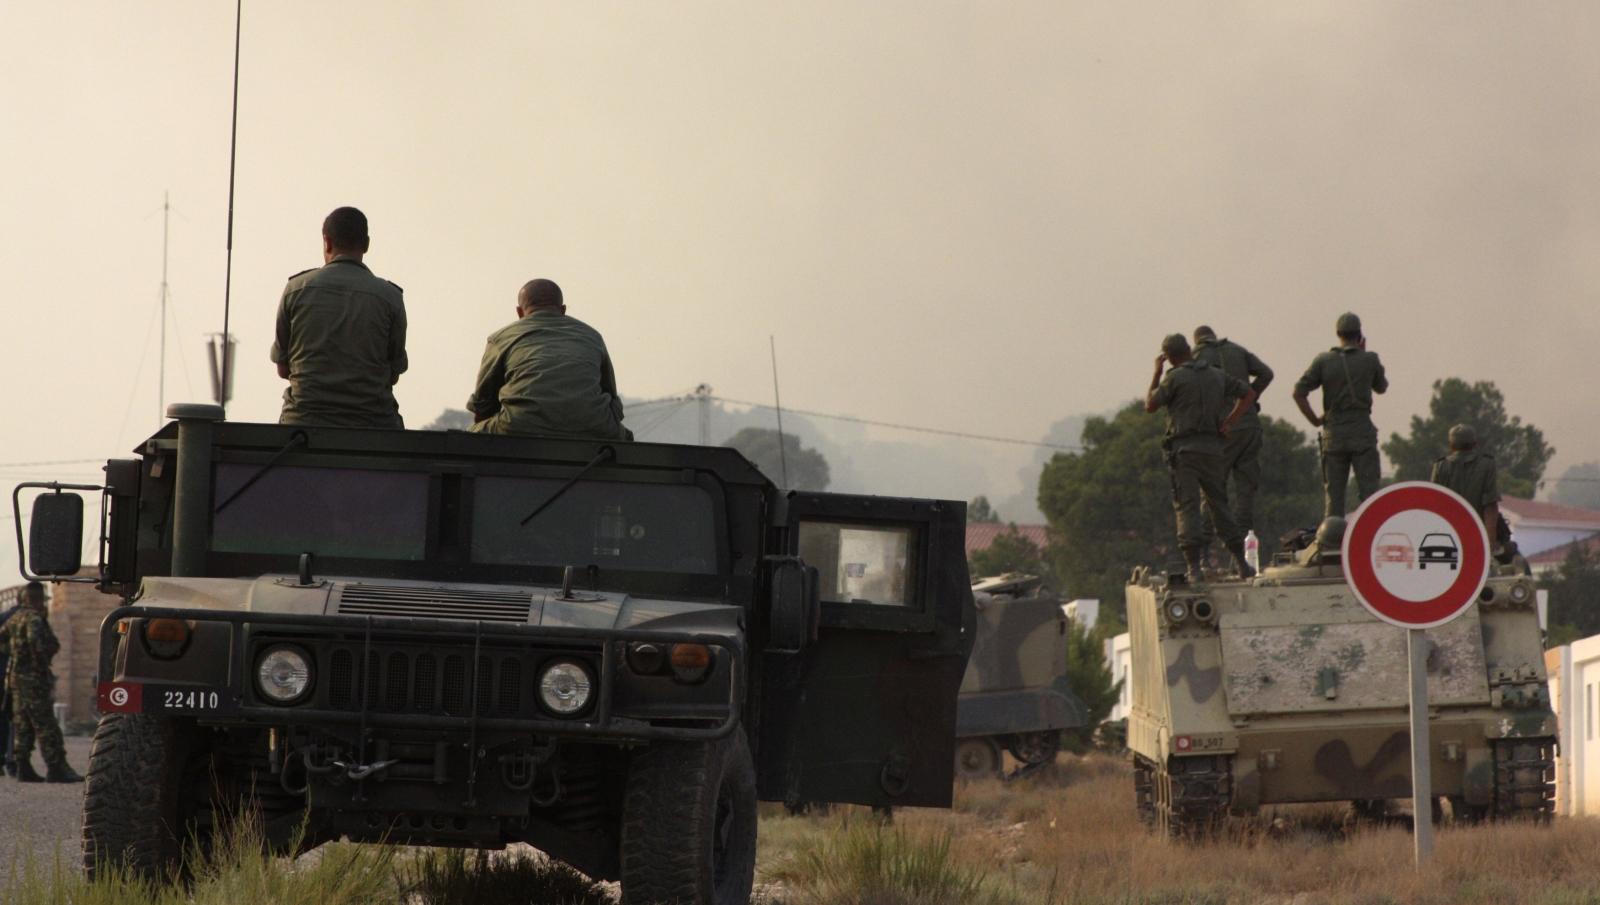 Tunisian soldiers gather near the border with Algeria around Mount Chaambi, western Tunisi